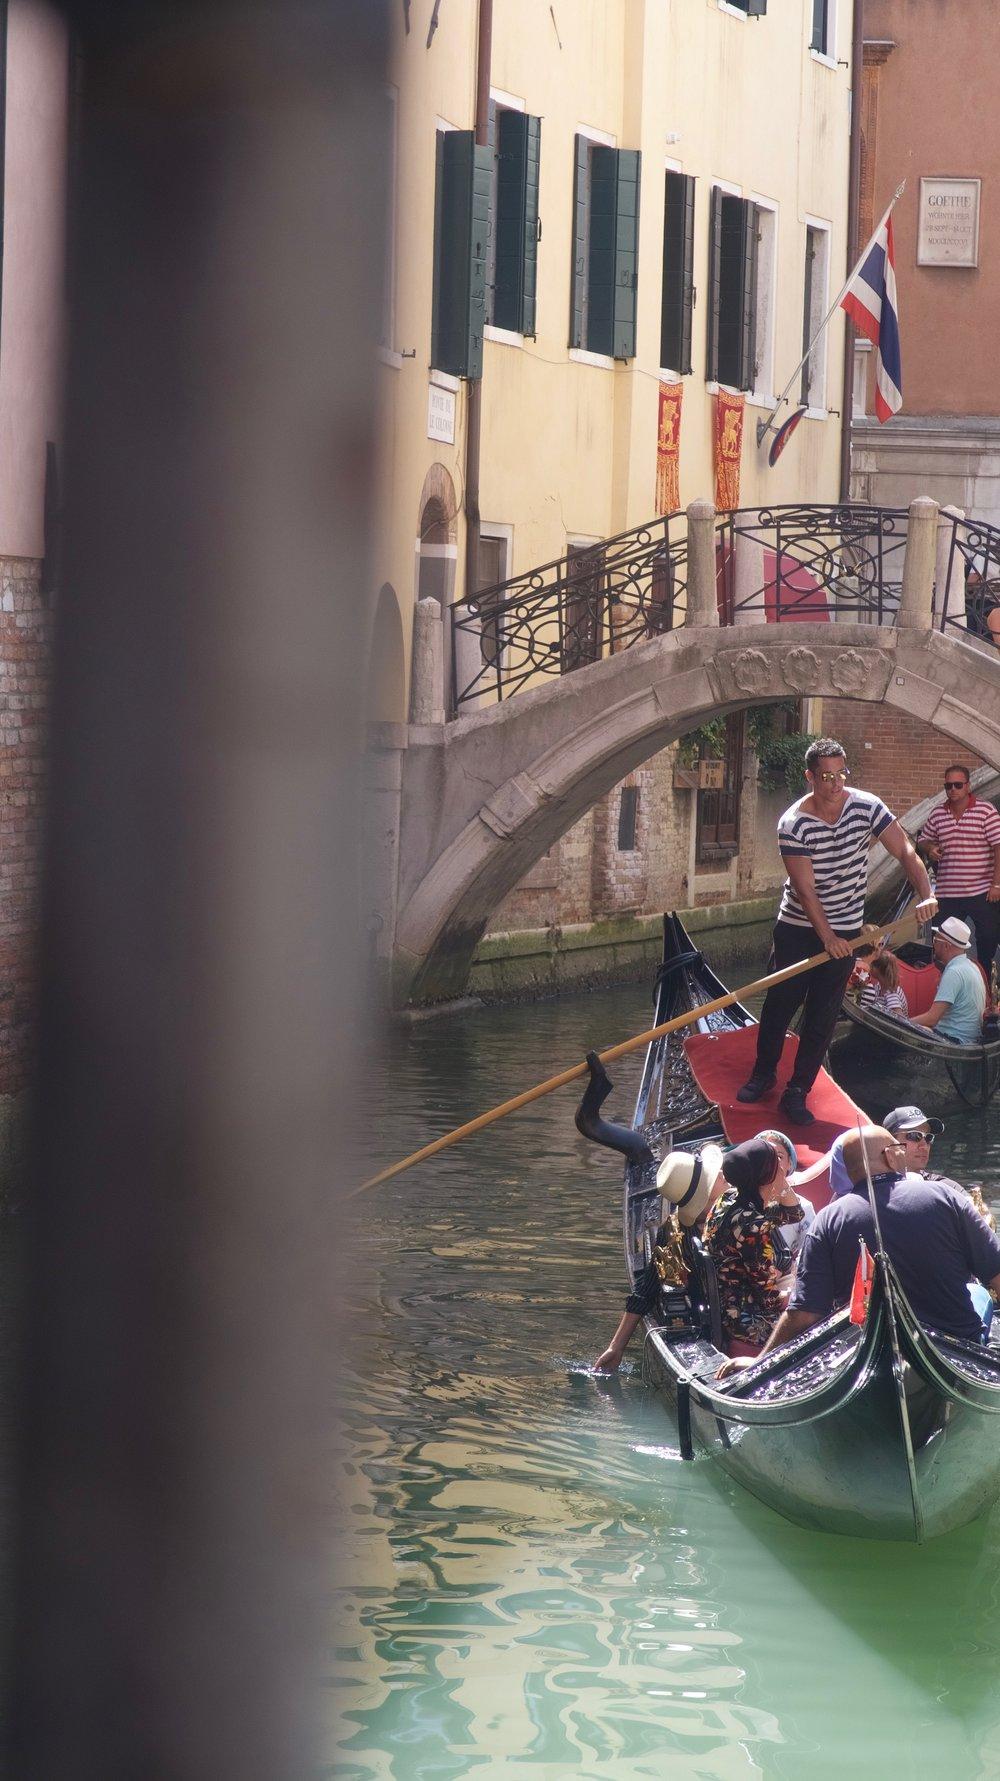 - gondolas for days